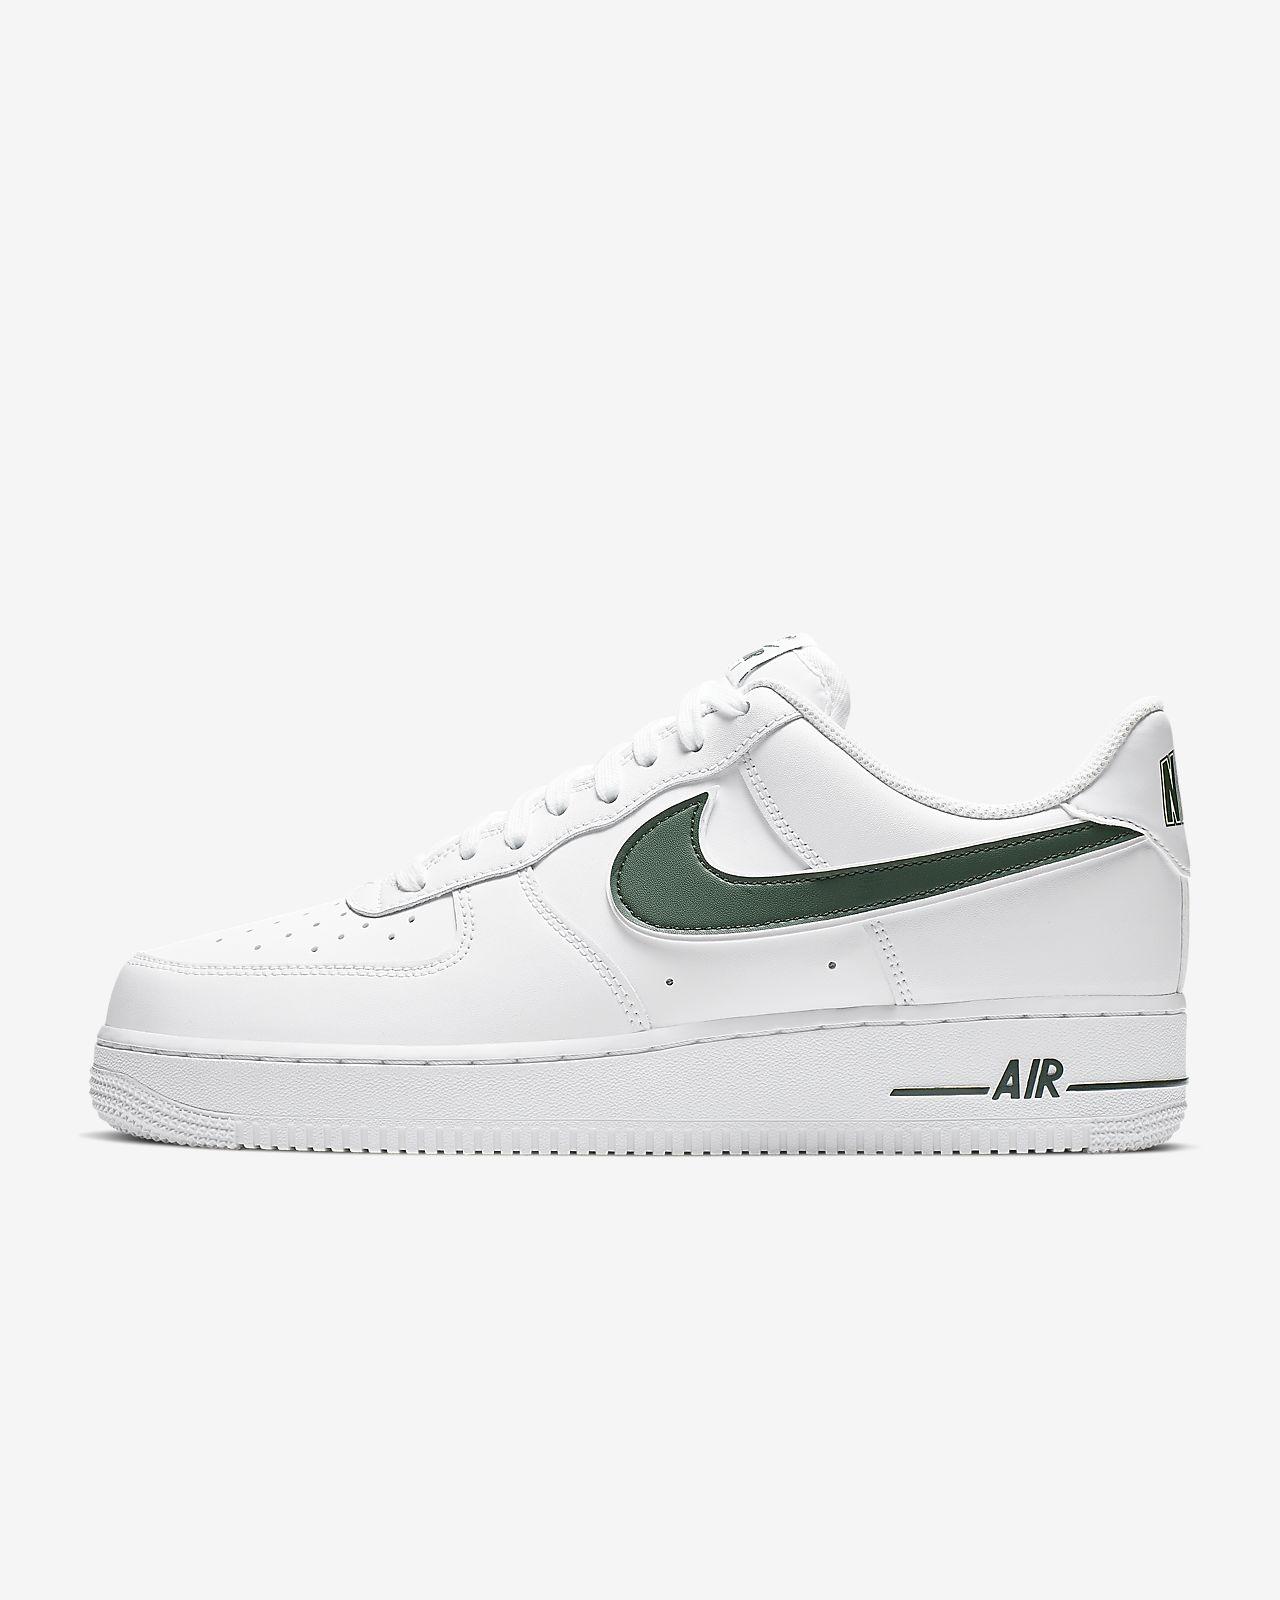 hot sale online d0307 9c0d2 ... Sko Nike Air Force 1  07 för män